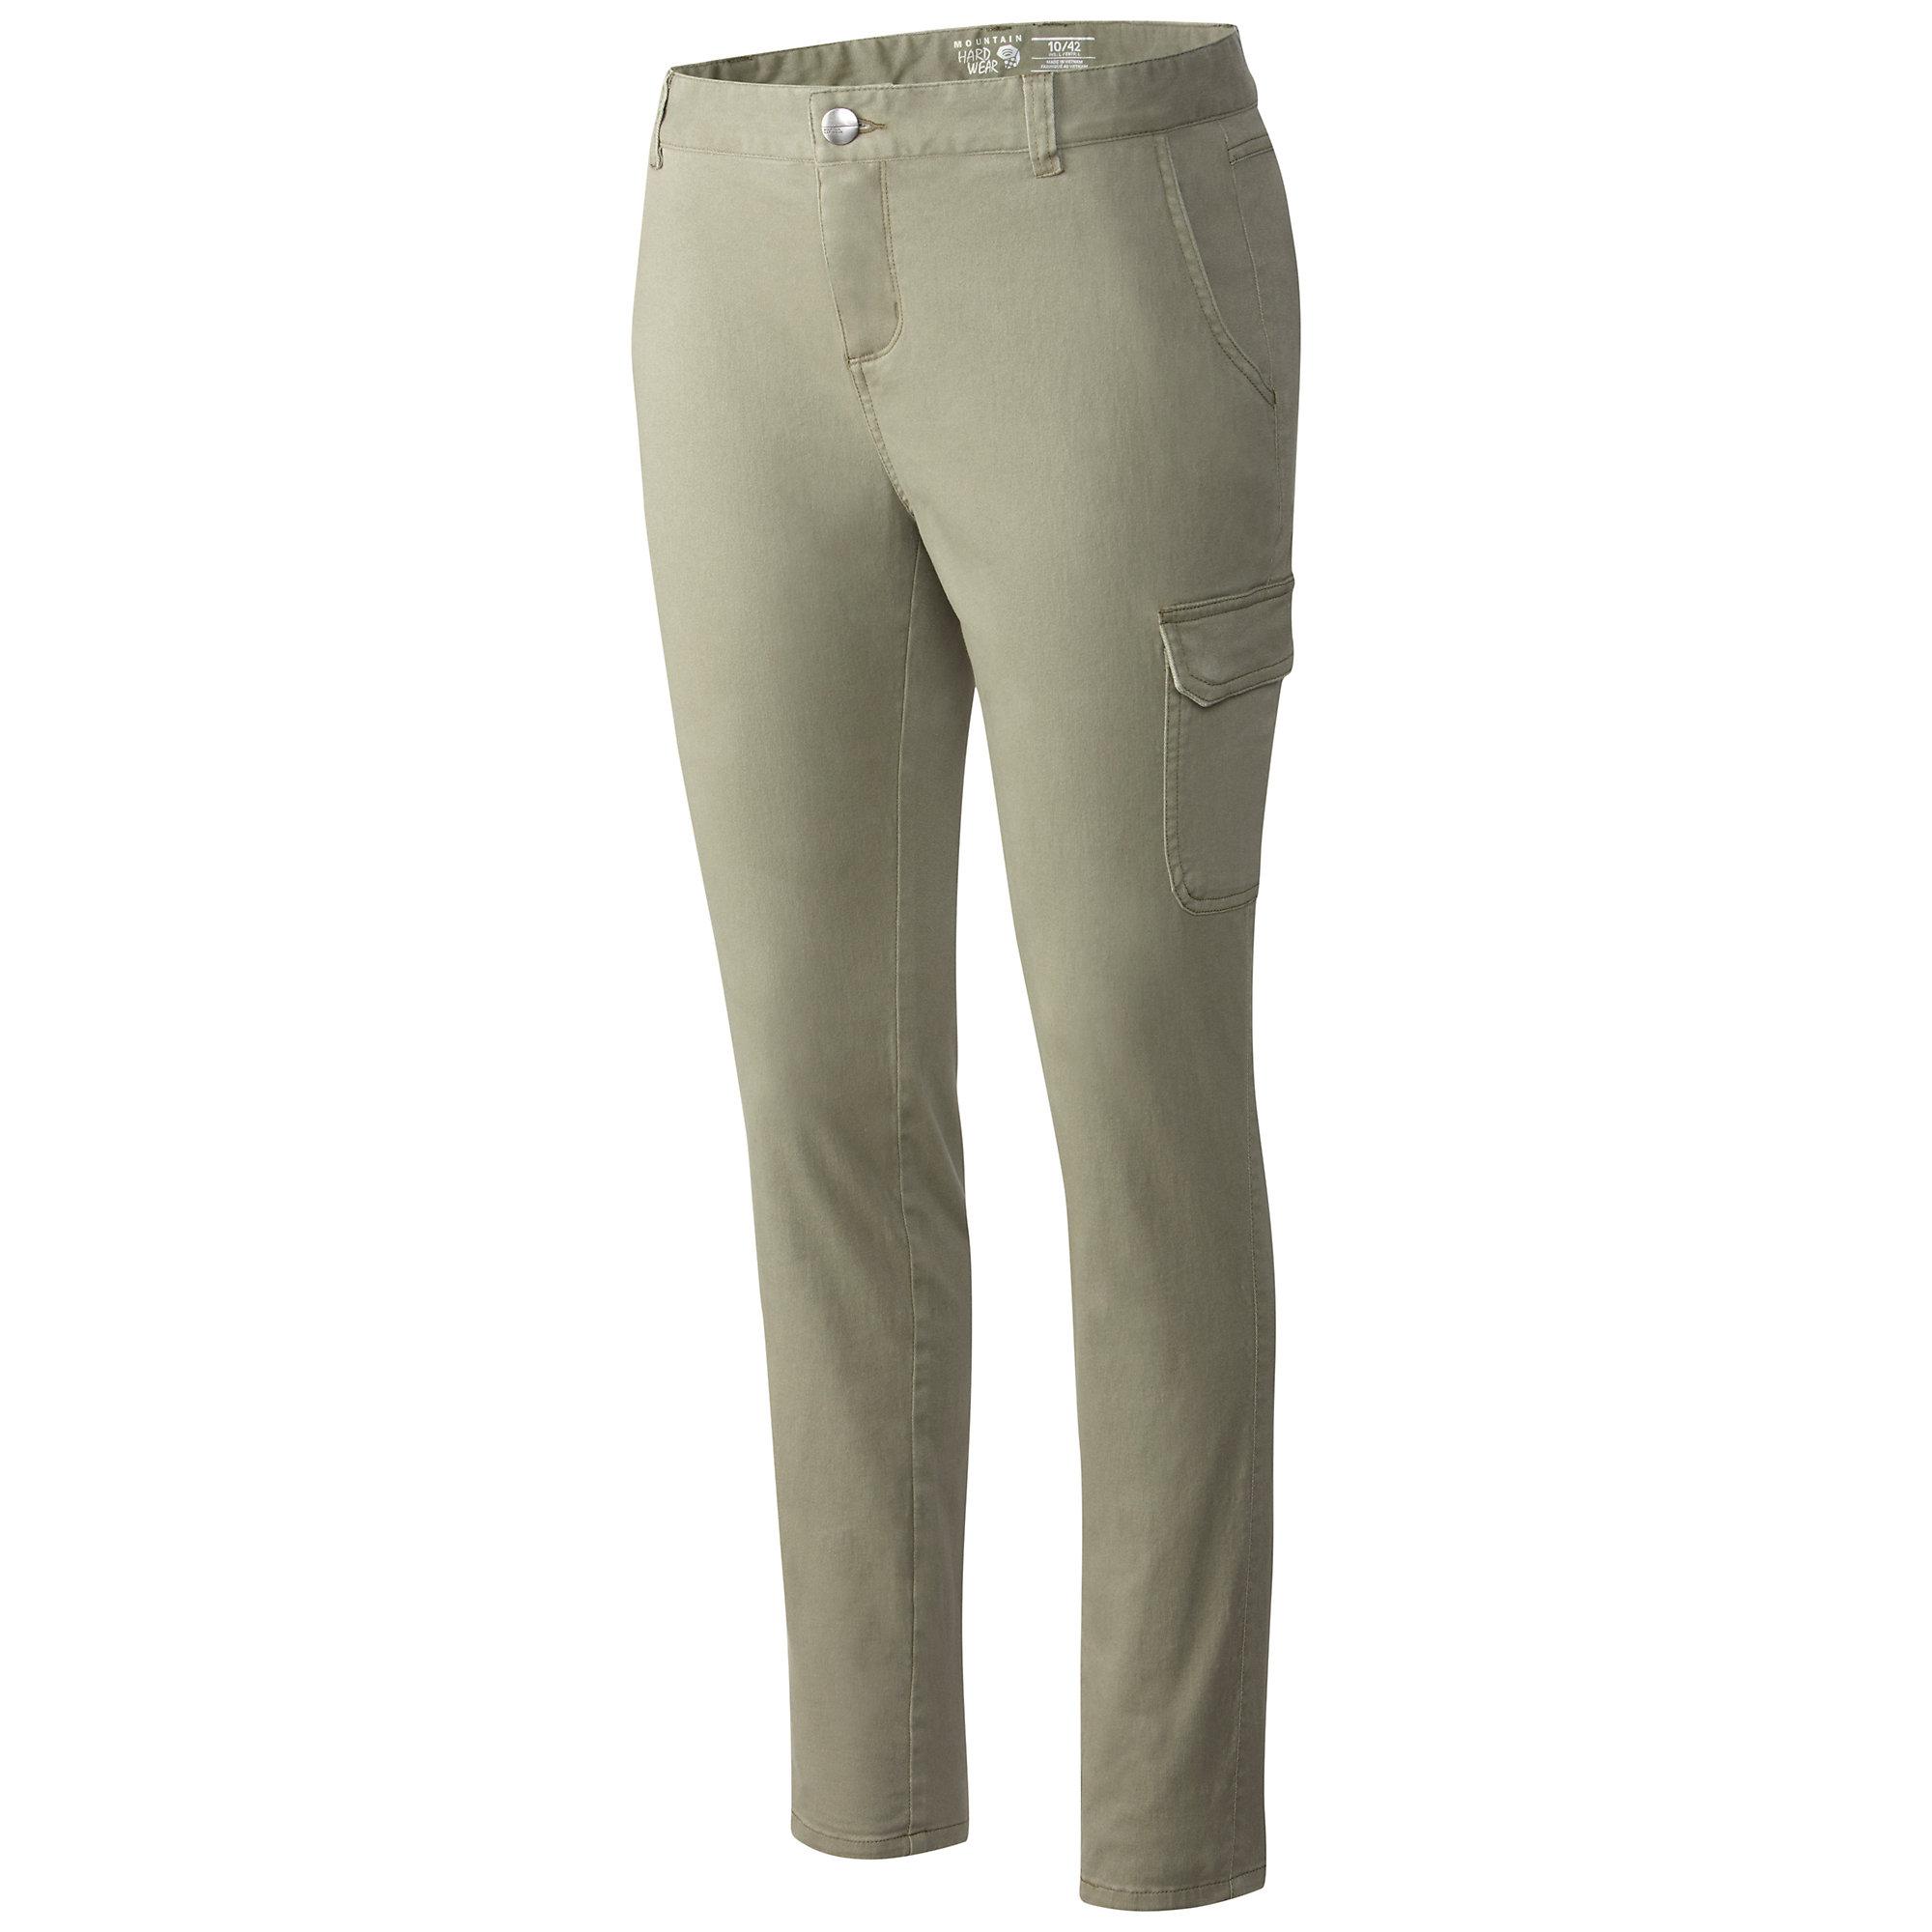 Mountain Hardwear Sojourner Twill Cargo Pant